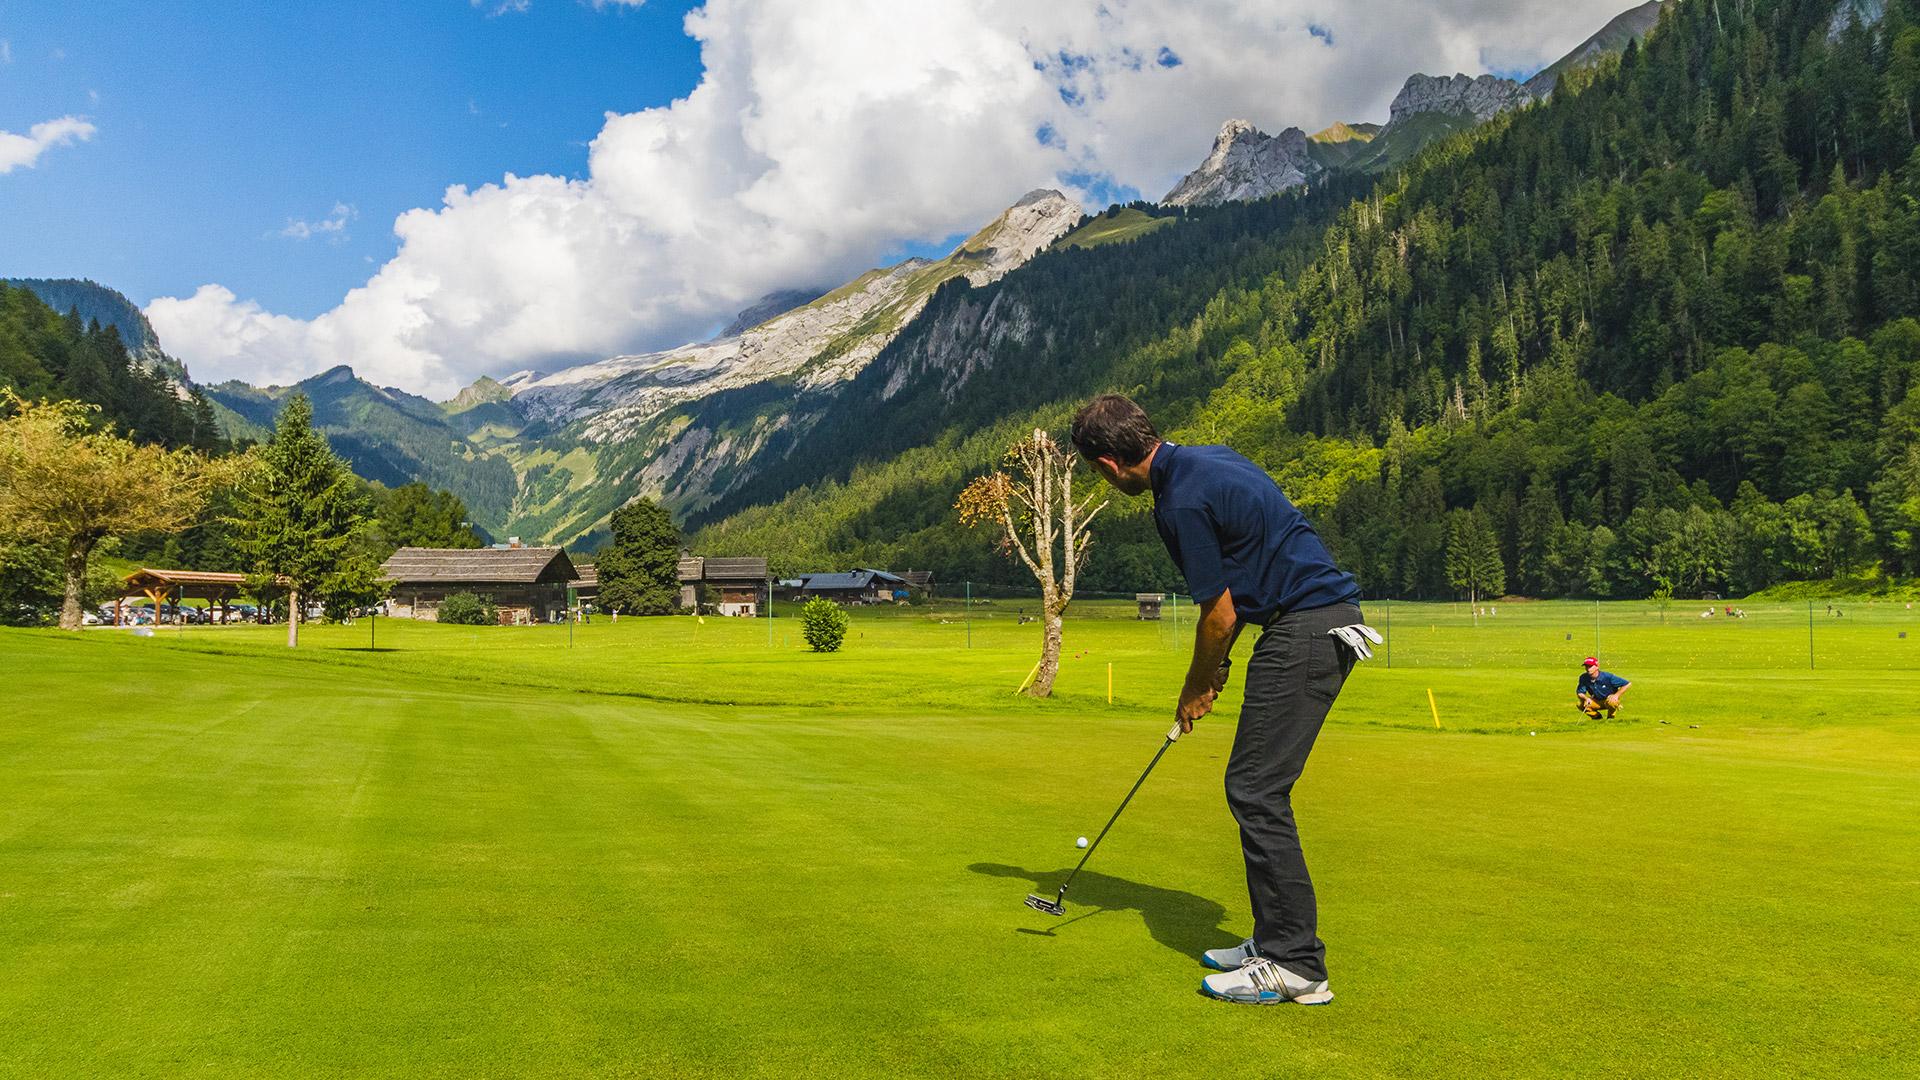 e17-6333-golf-c-cattin-alpcatmedias-le-grand-bornand-147489